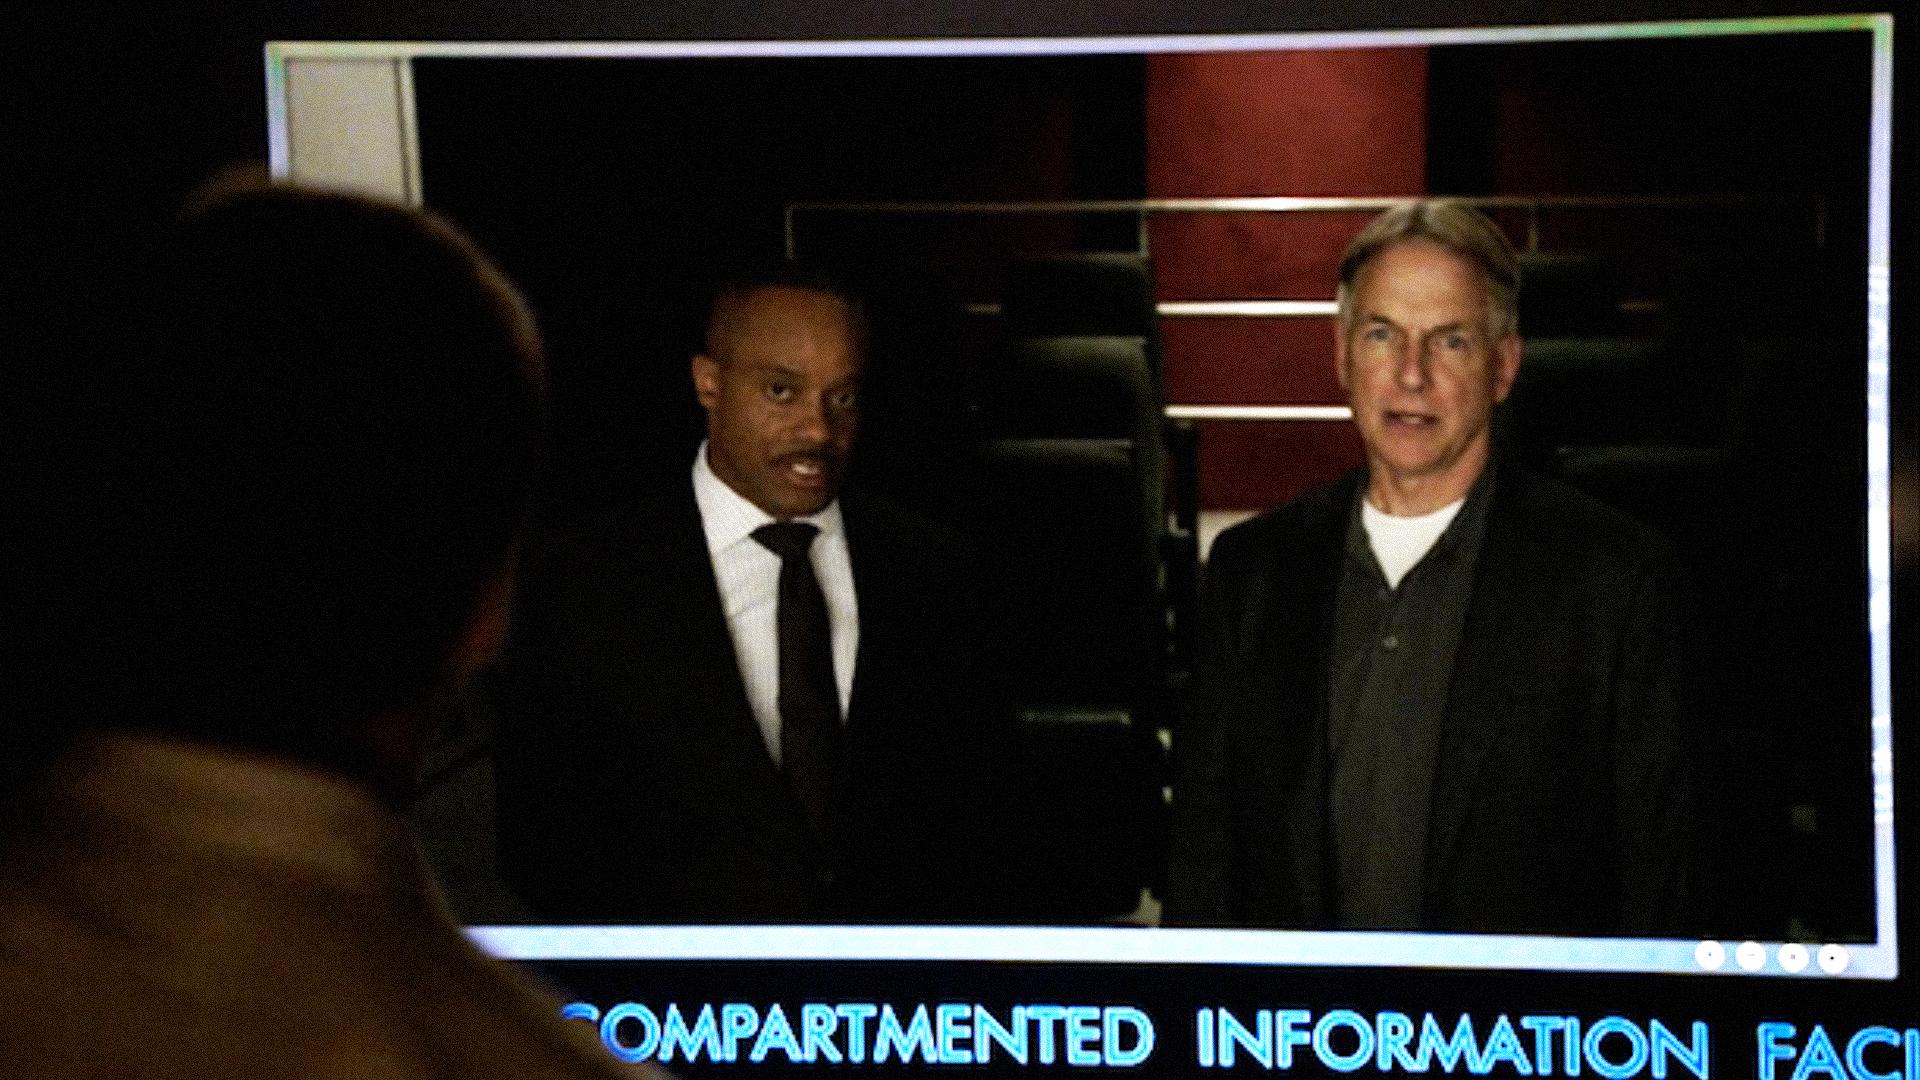 Leon Vance and Leroy Jethro Gibbs on NCIS: New Orleans